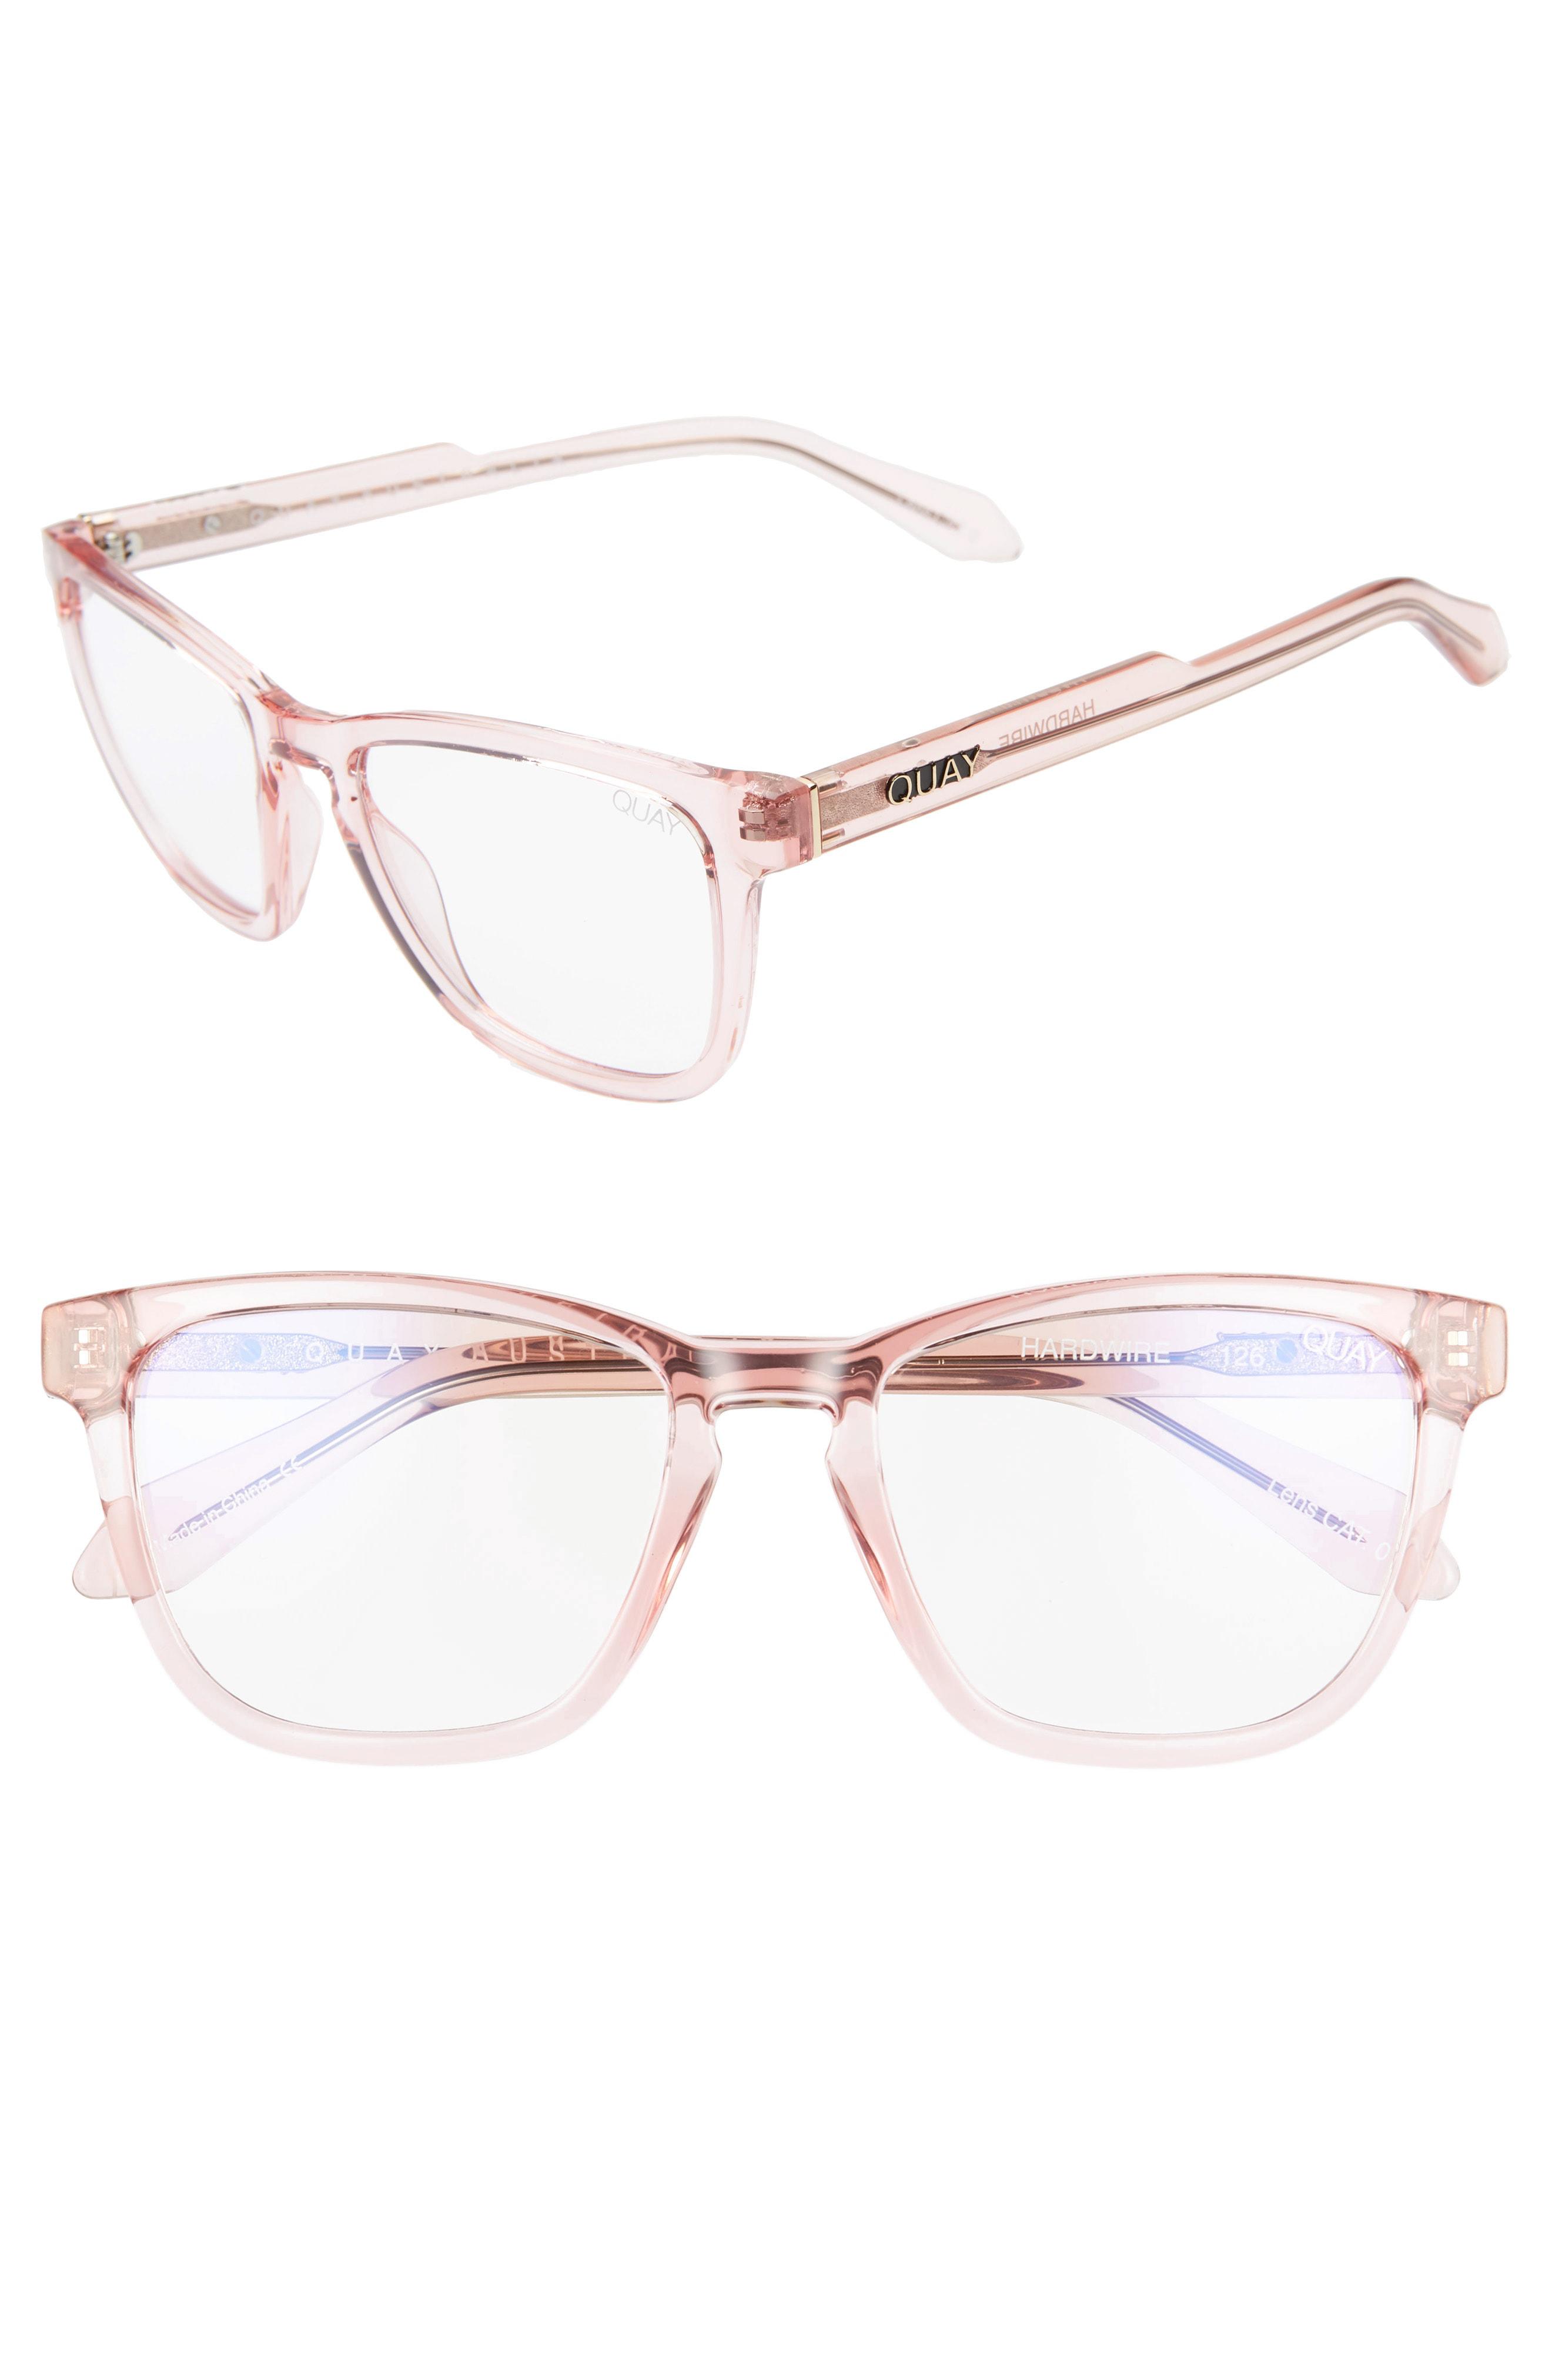 86ebc6c669 Quay Hardwire 54Mm Blue Light Blocking Glasses - Pink